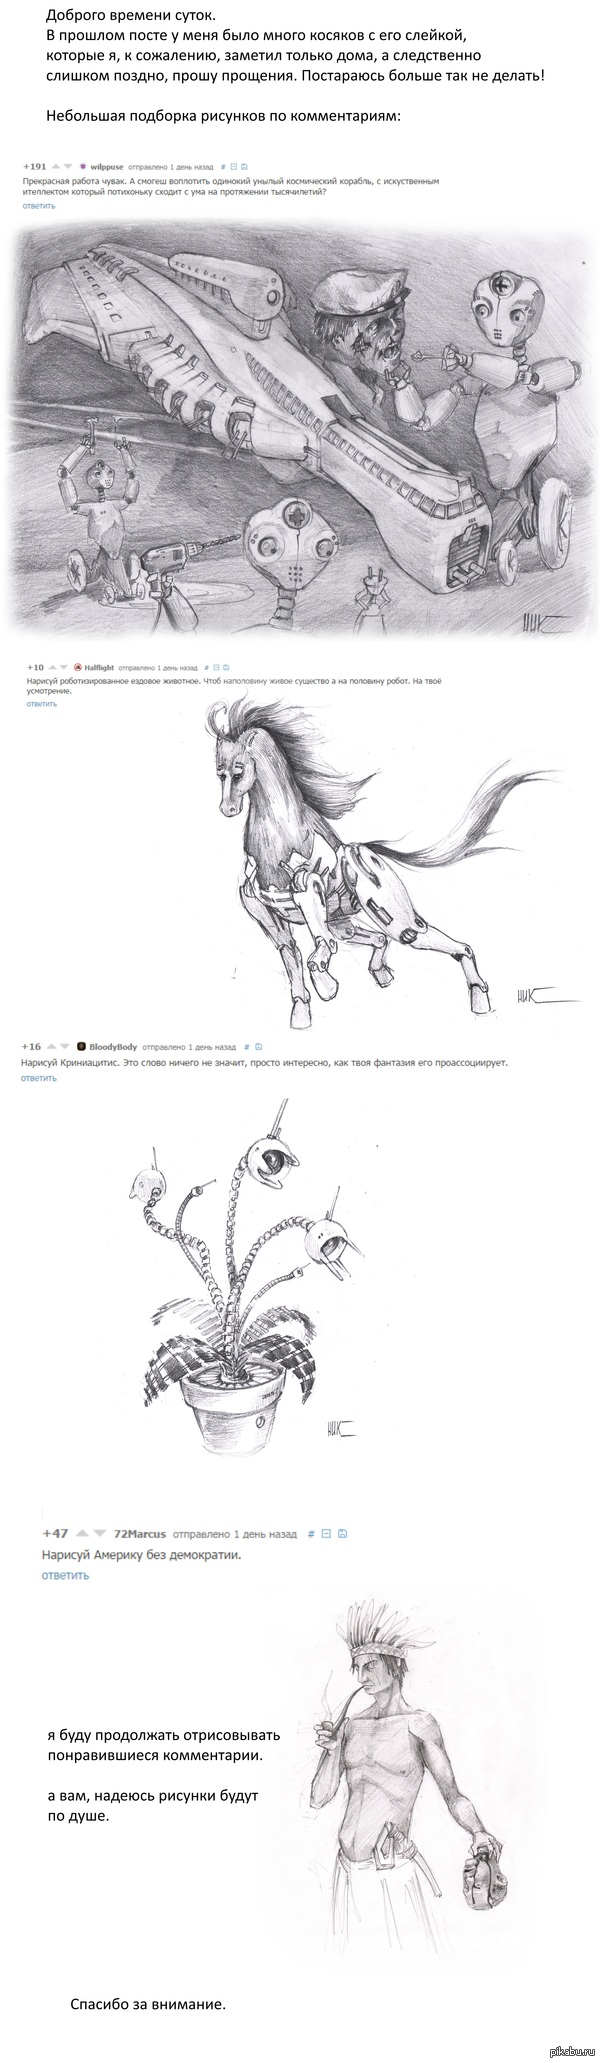 "Рисунки по мотивам комментов (посерьёзнее) часть менее серьёзная:  <a href=""http://pikabu.ru/story/po_motivam_kommentov_2723286"">http://pikabu.ru/story/_2723286</a>"